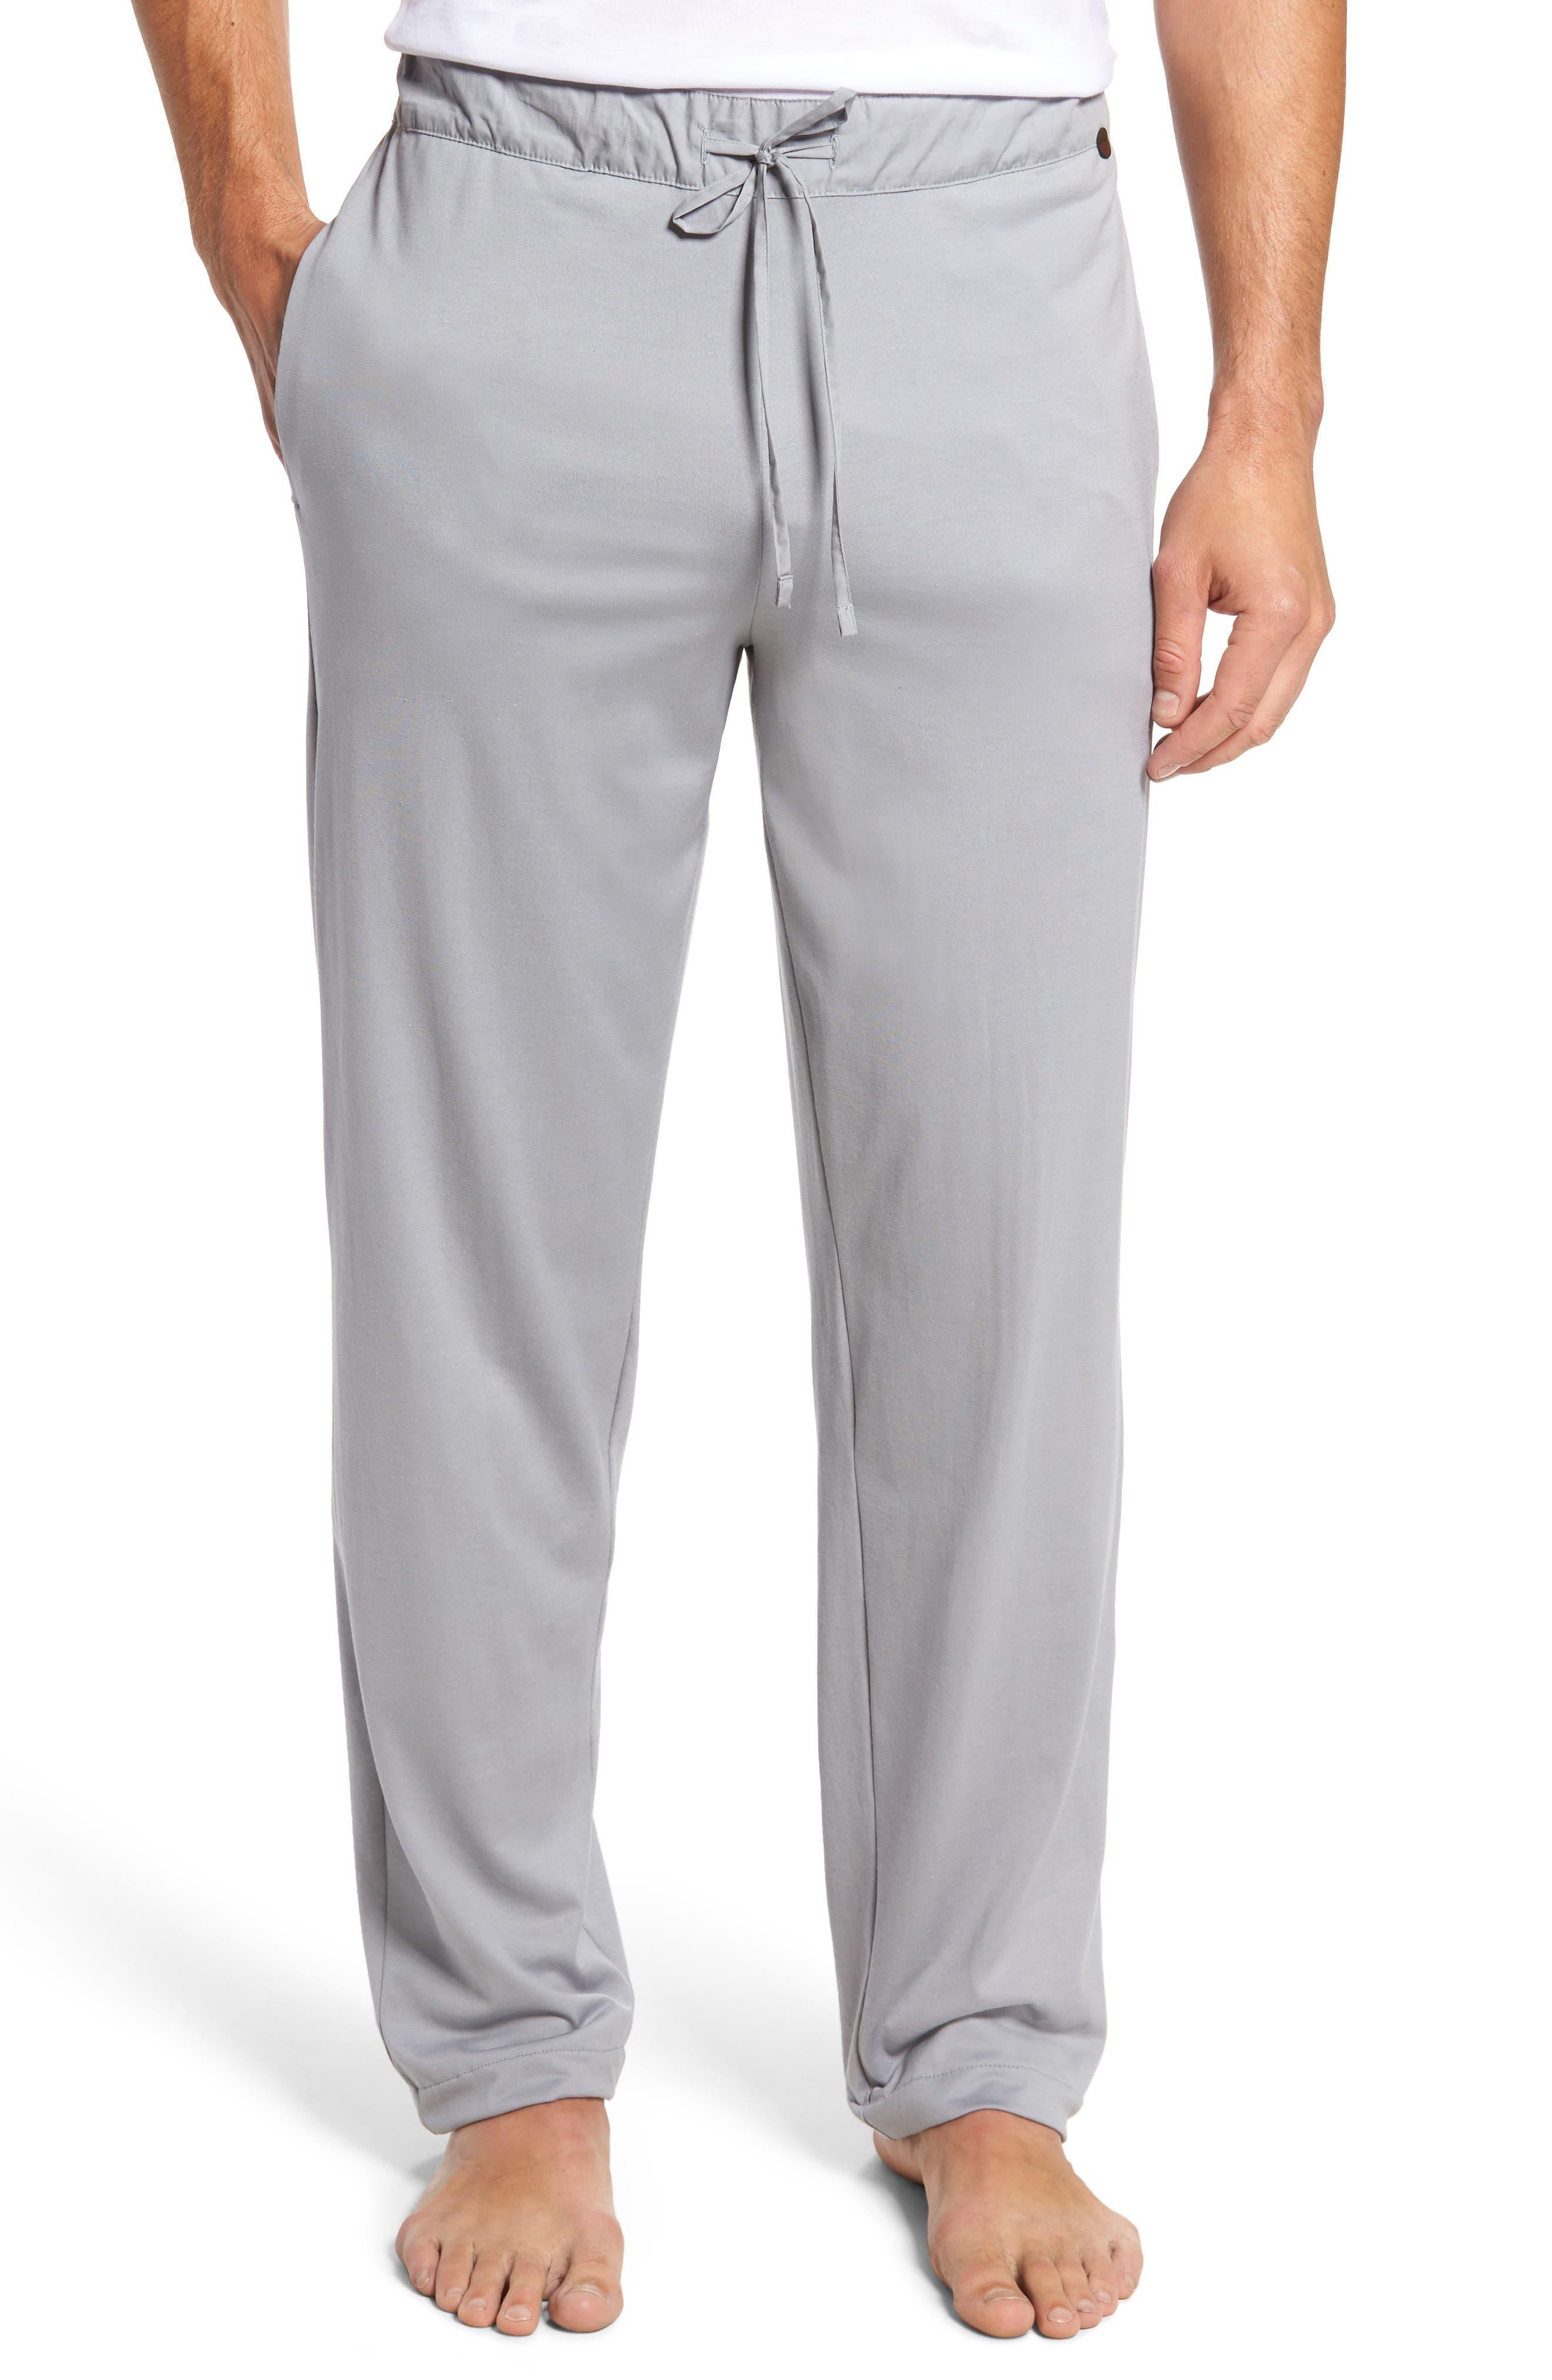 Main Image - Hanro Night & Day Knit Lounge Pants